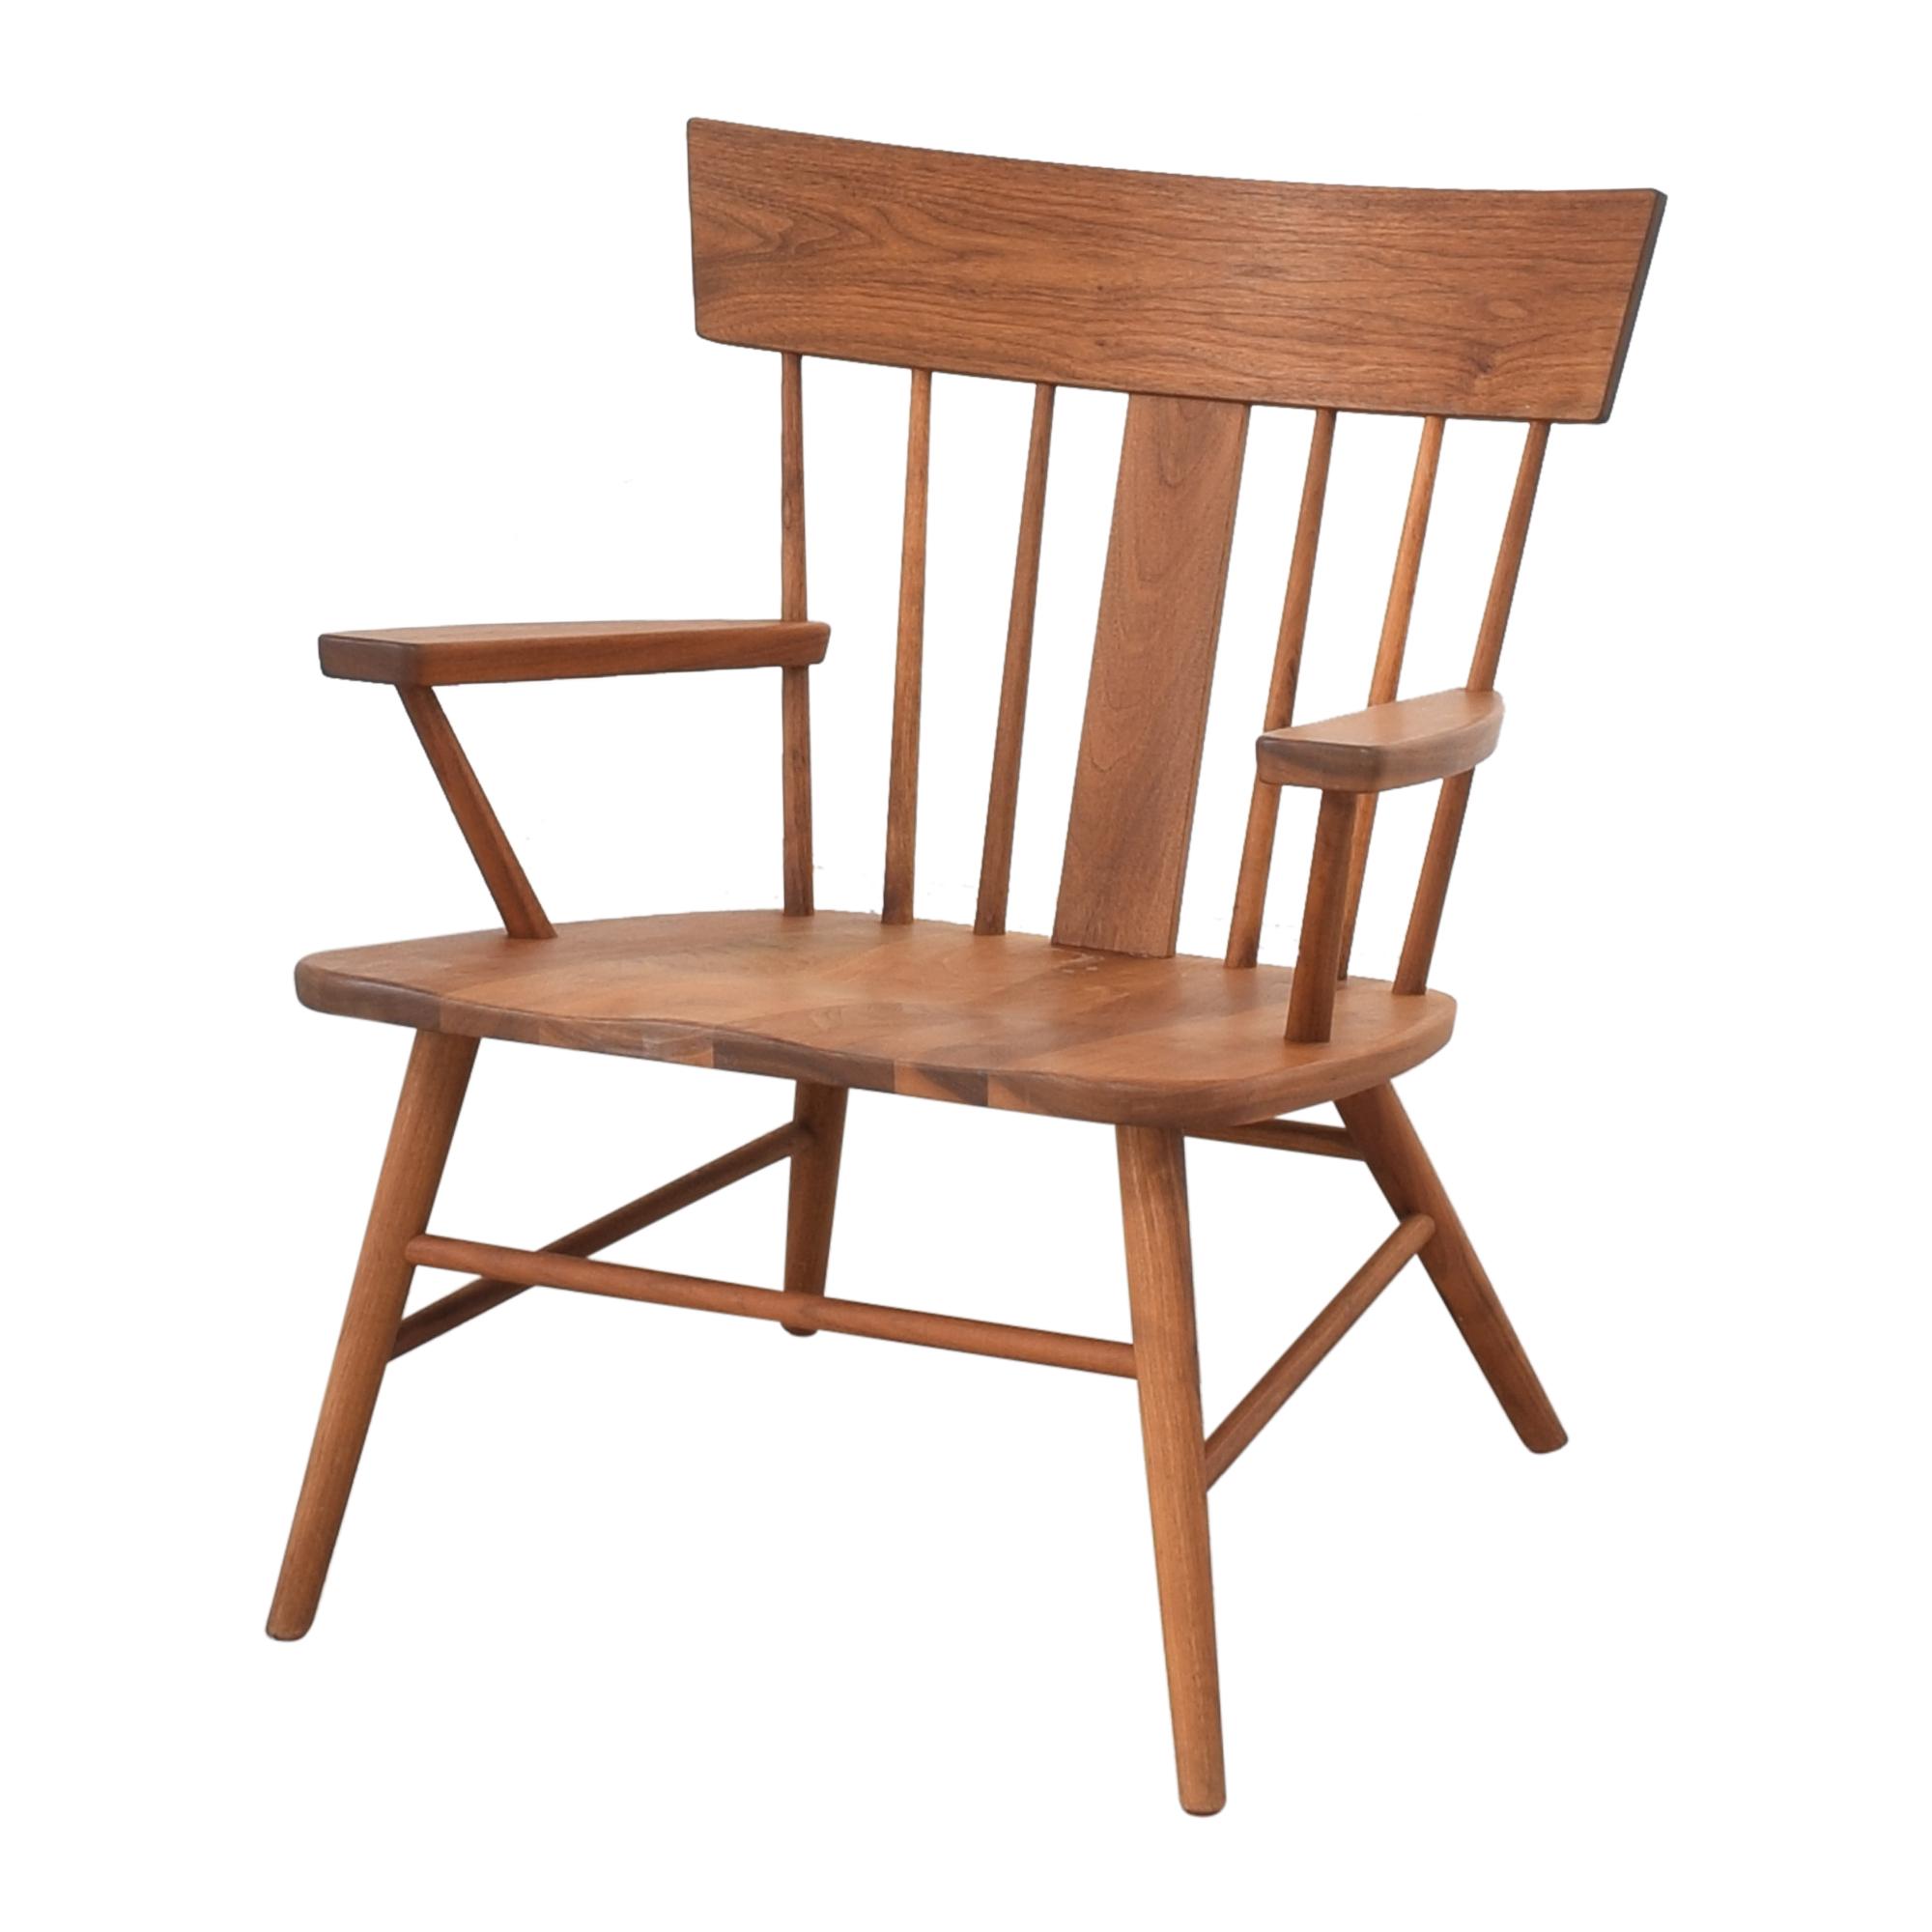 Room & Board Sandberg Chair Room & Board